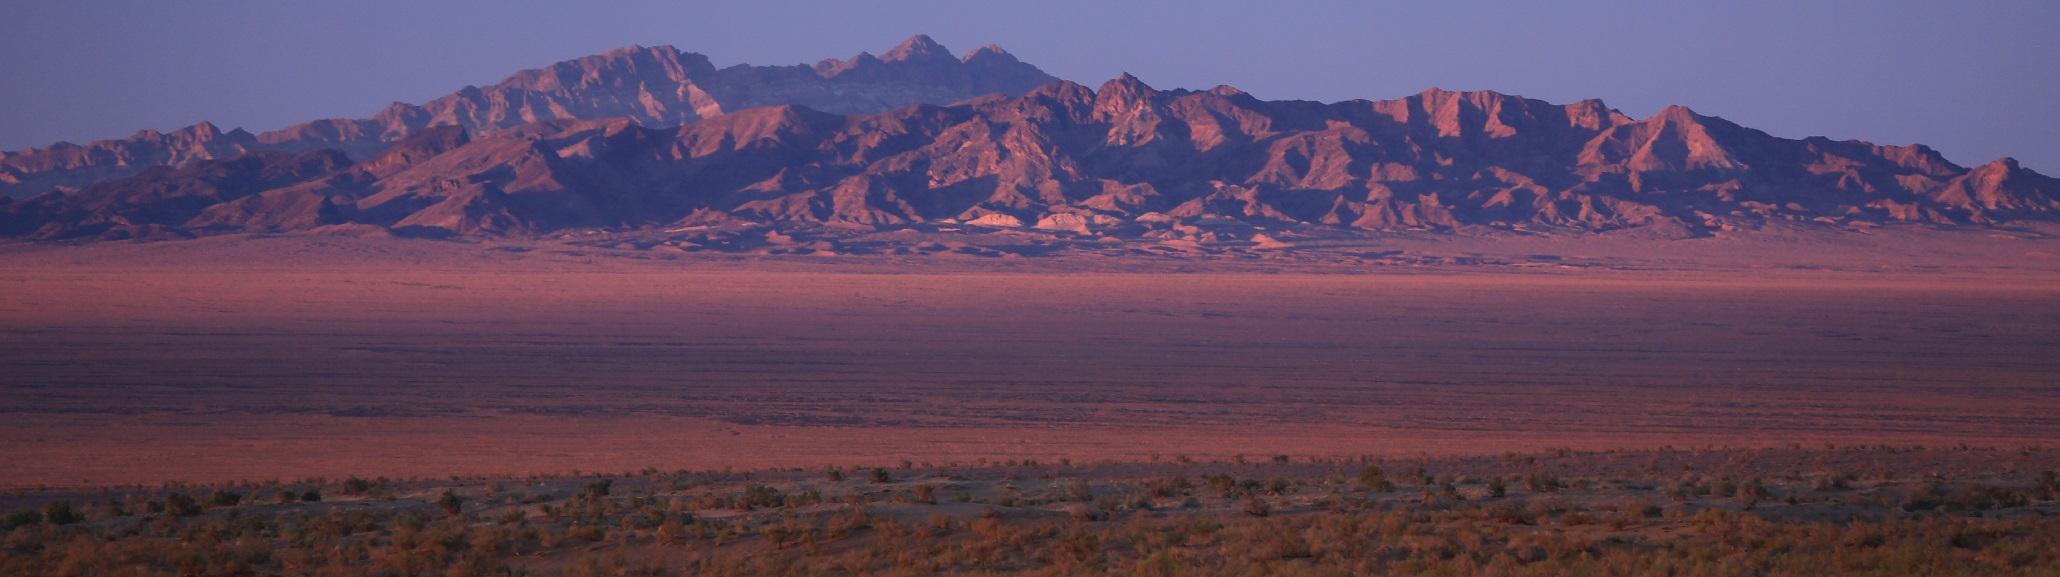 Red Desert wide